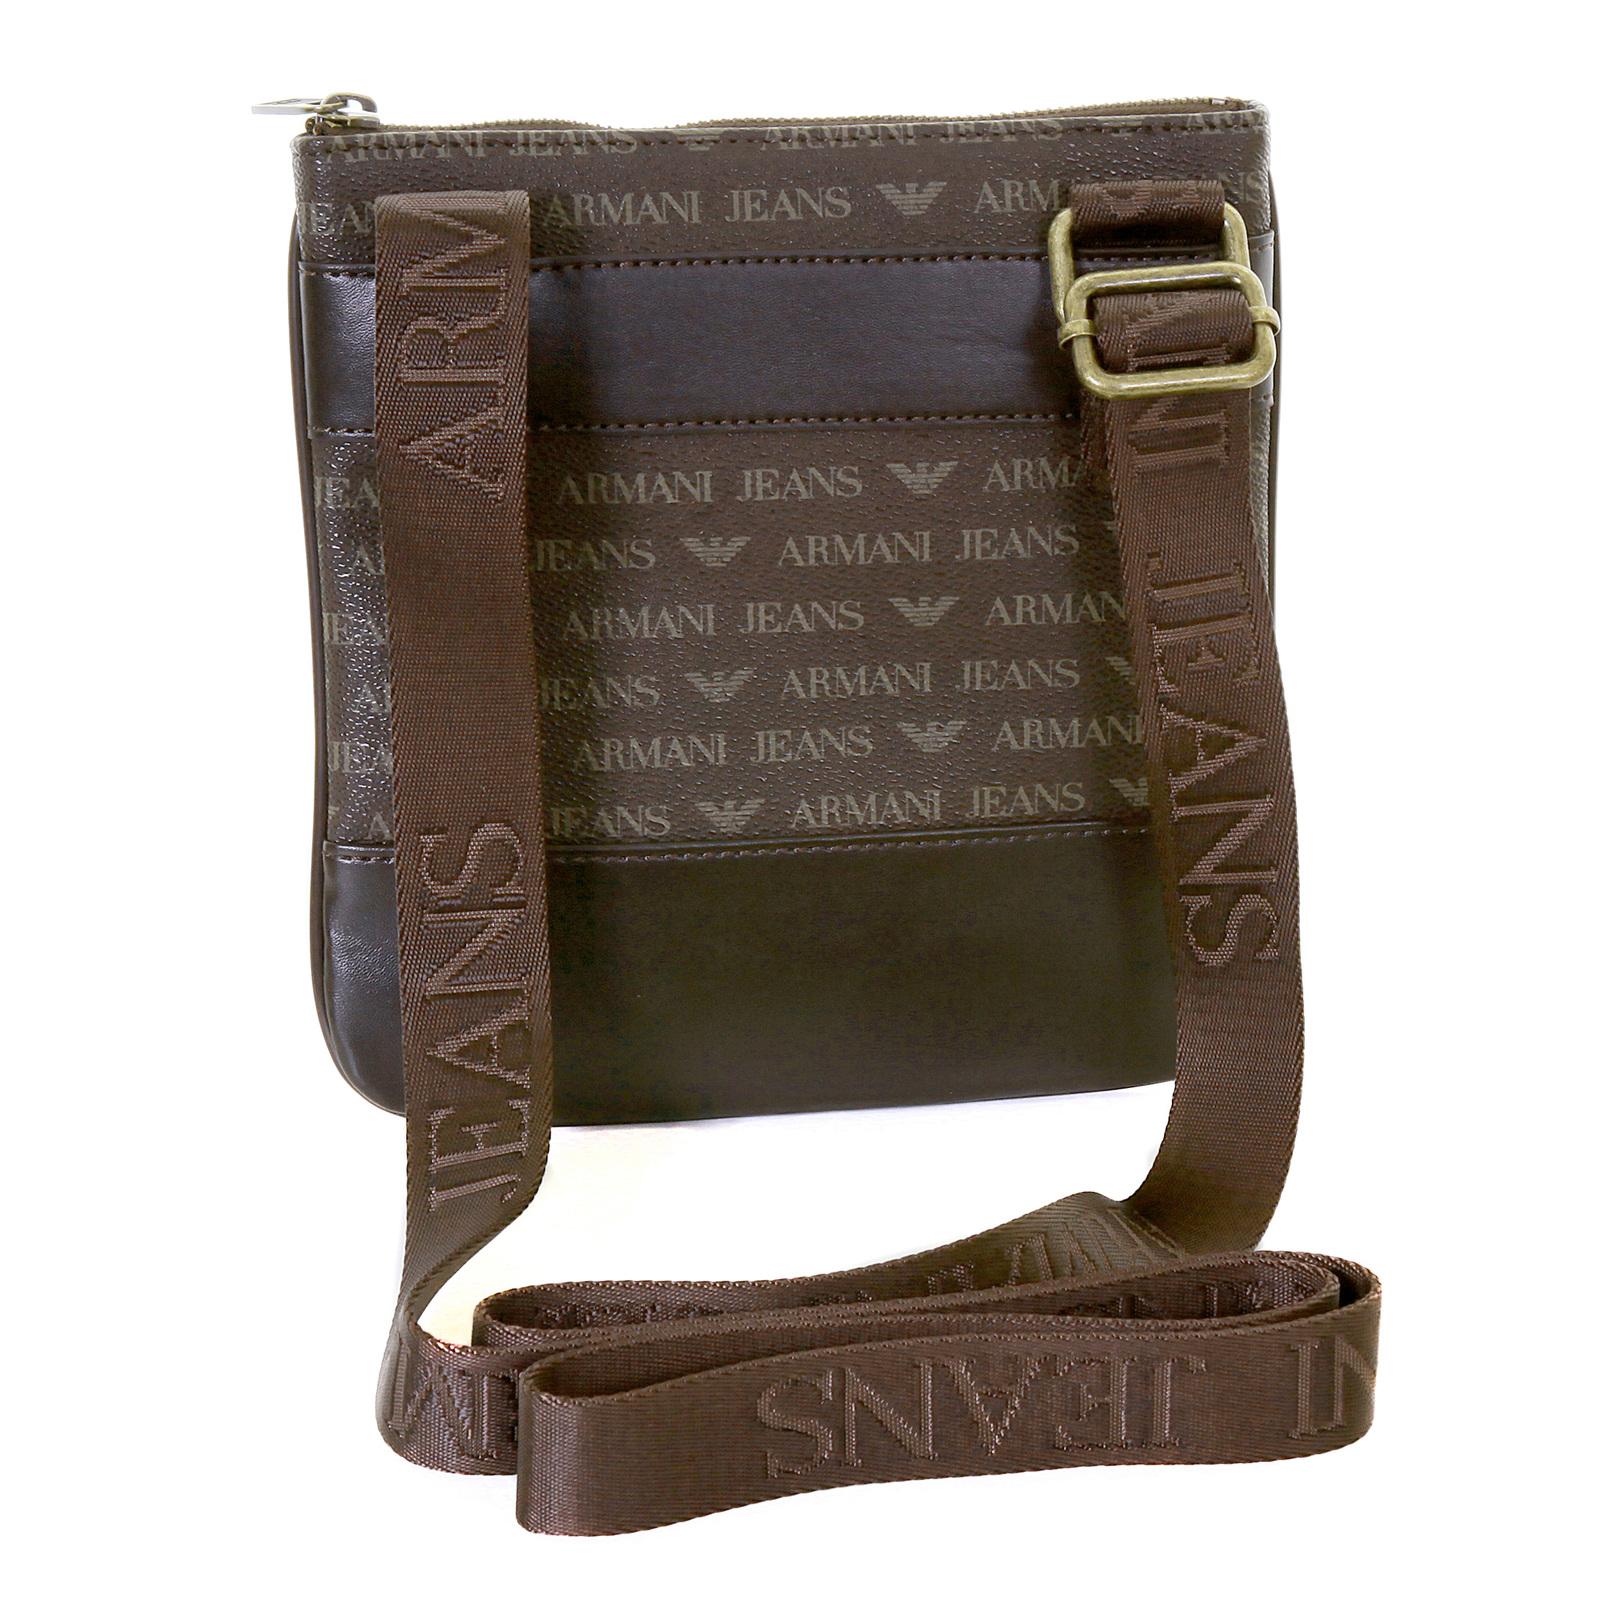 8327f06a1dec Armani Jeans mens brown logo small messenger bag AJM2472 at Togged Clothing